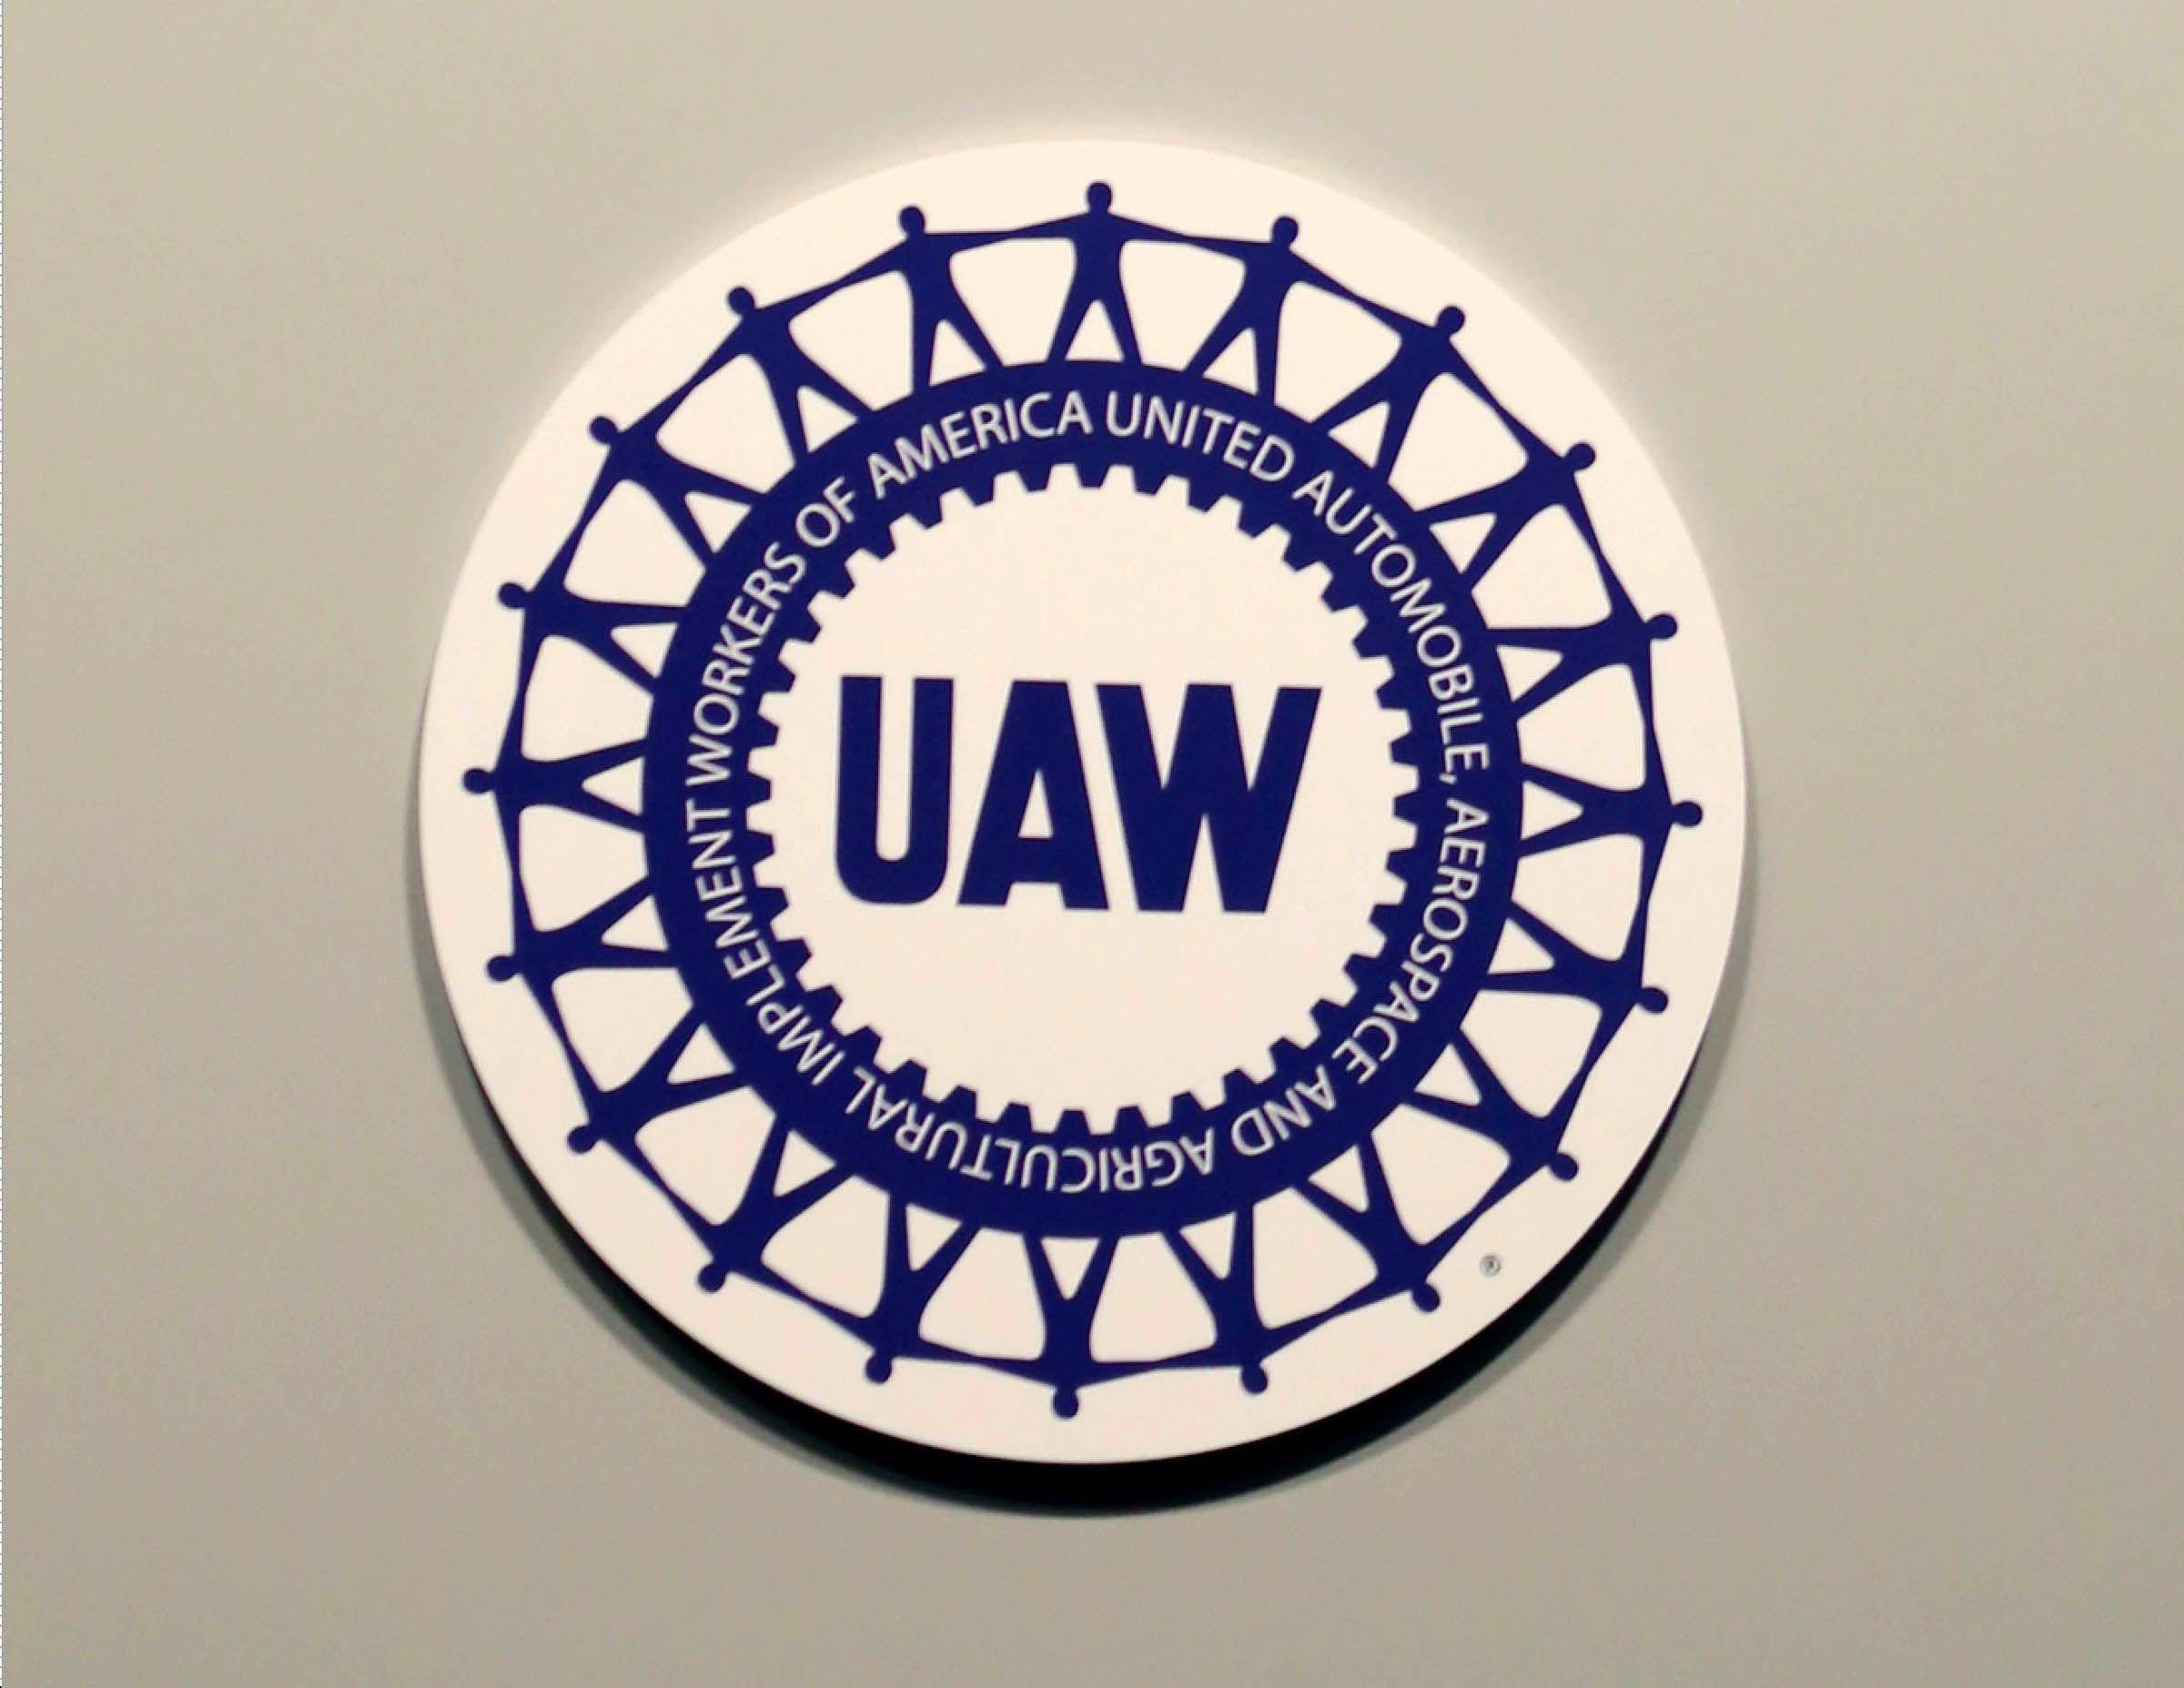 UAW International